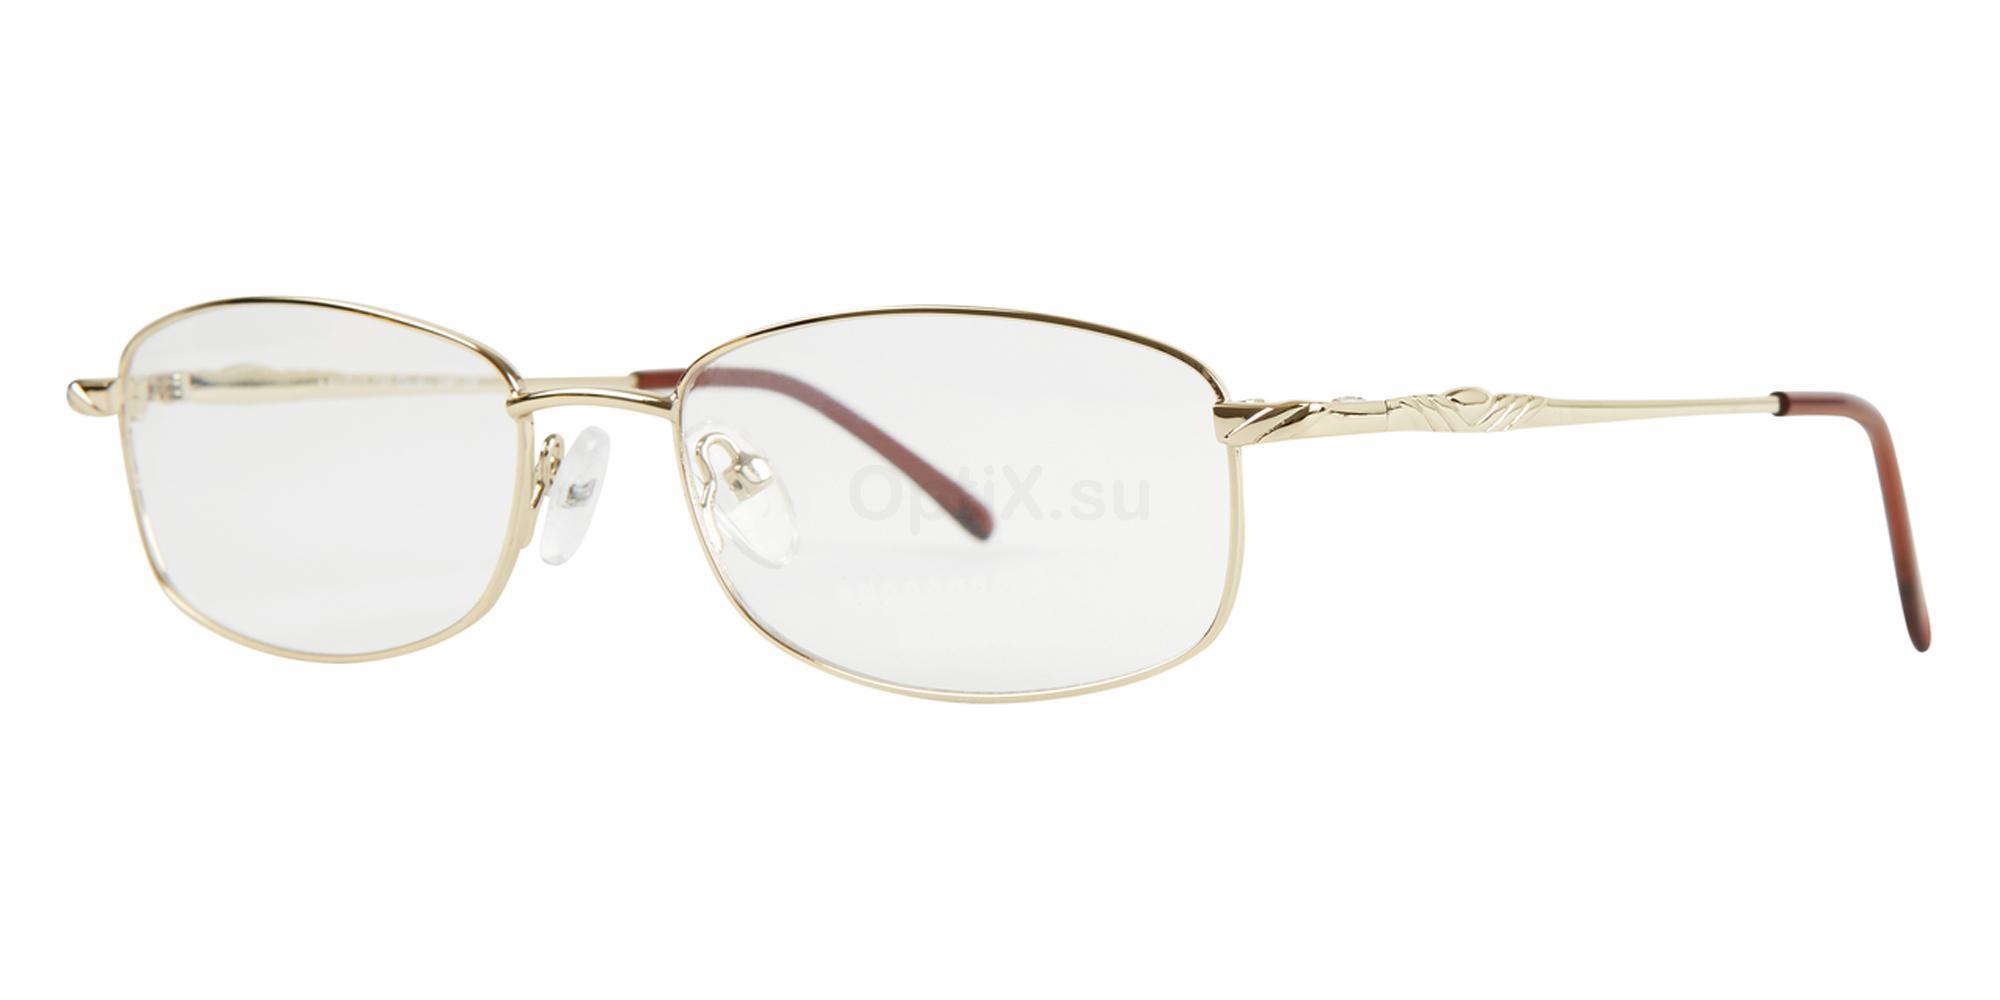 C1 Complete Mod 1 Glasses, Complete